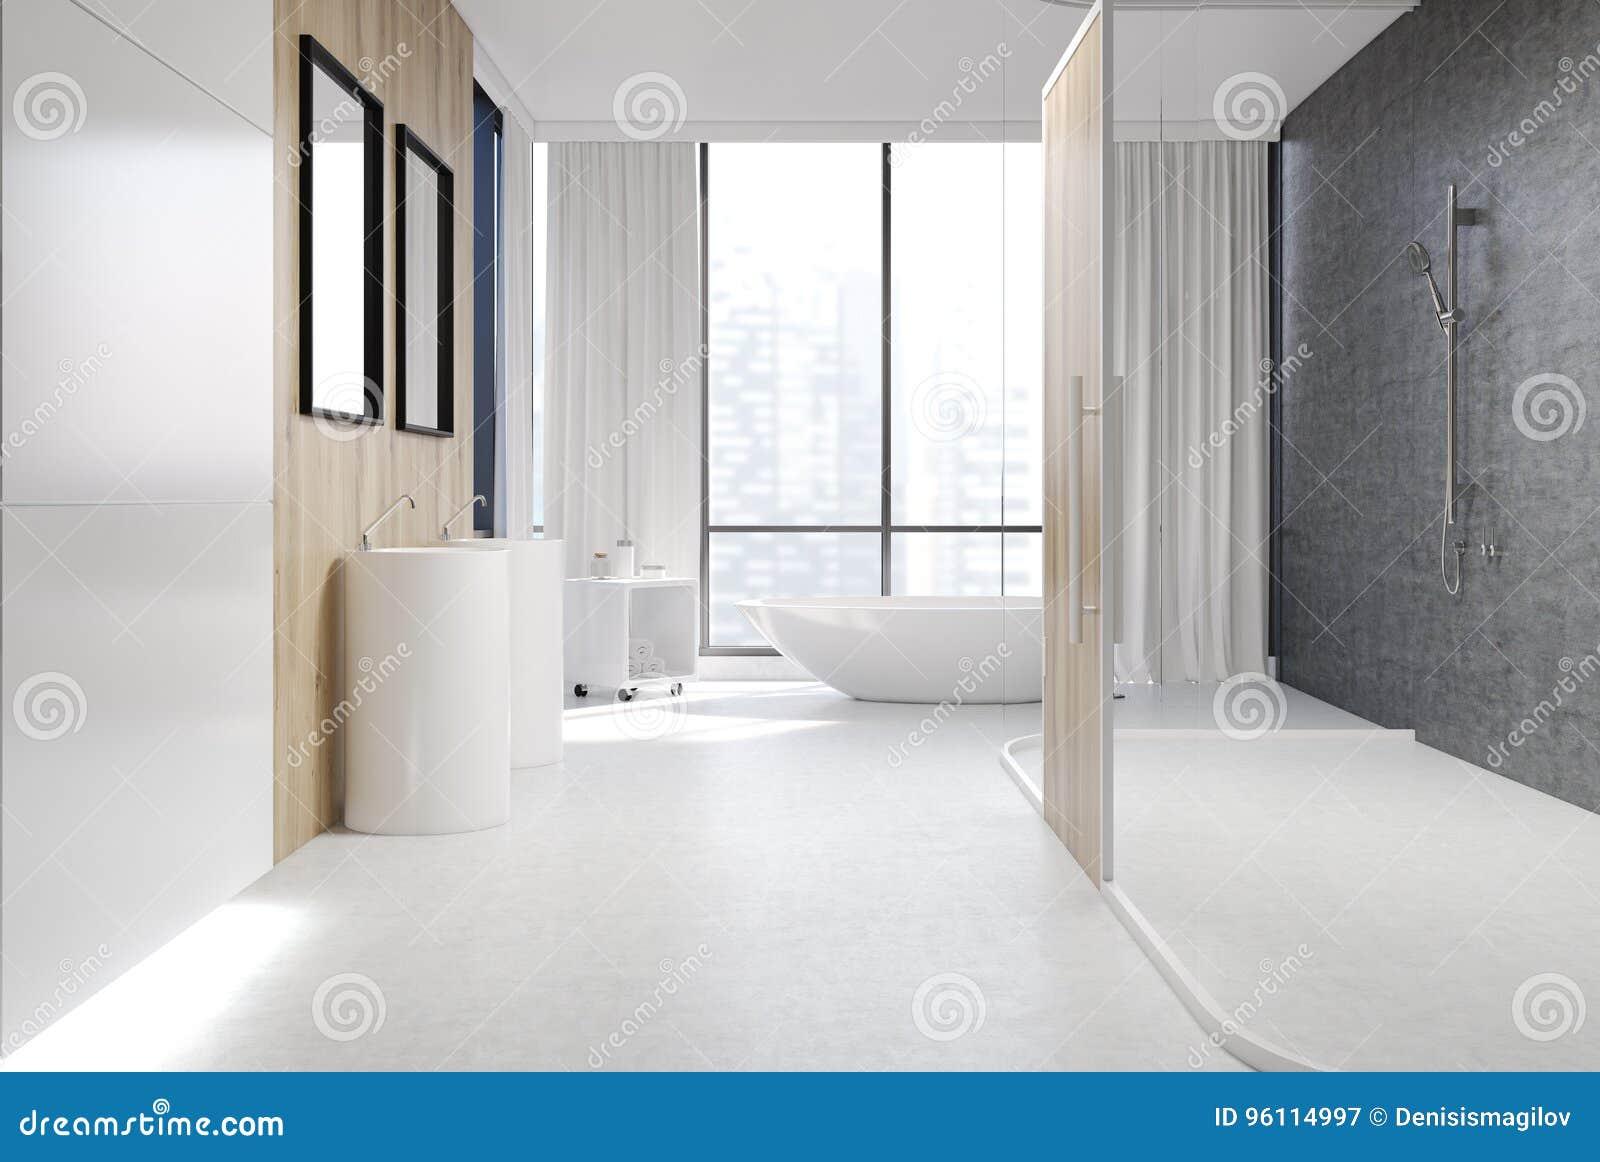 White And Wooden Bathroom, Shower Stock Illustration - Illustration ...